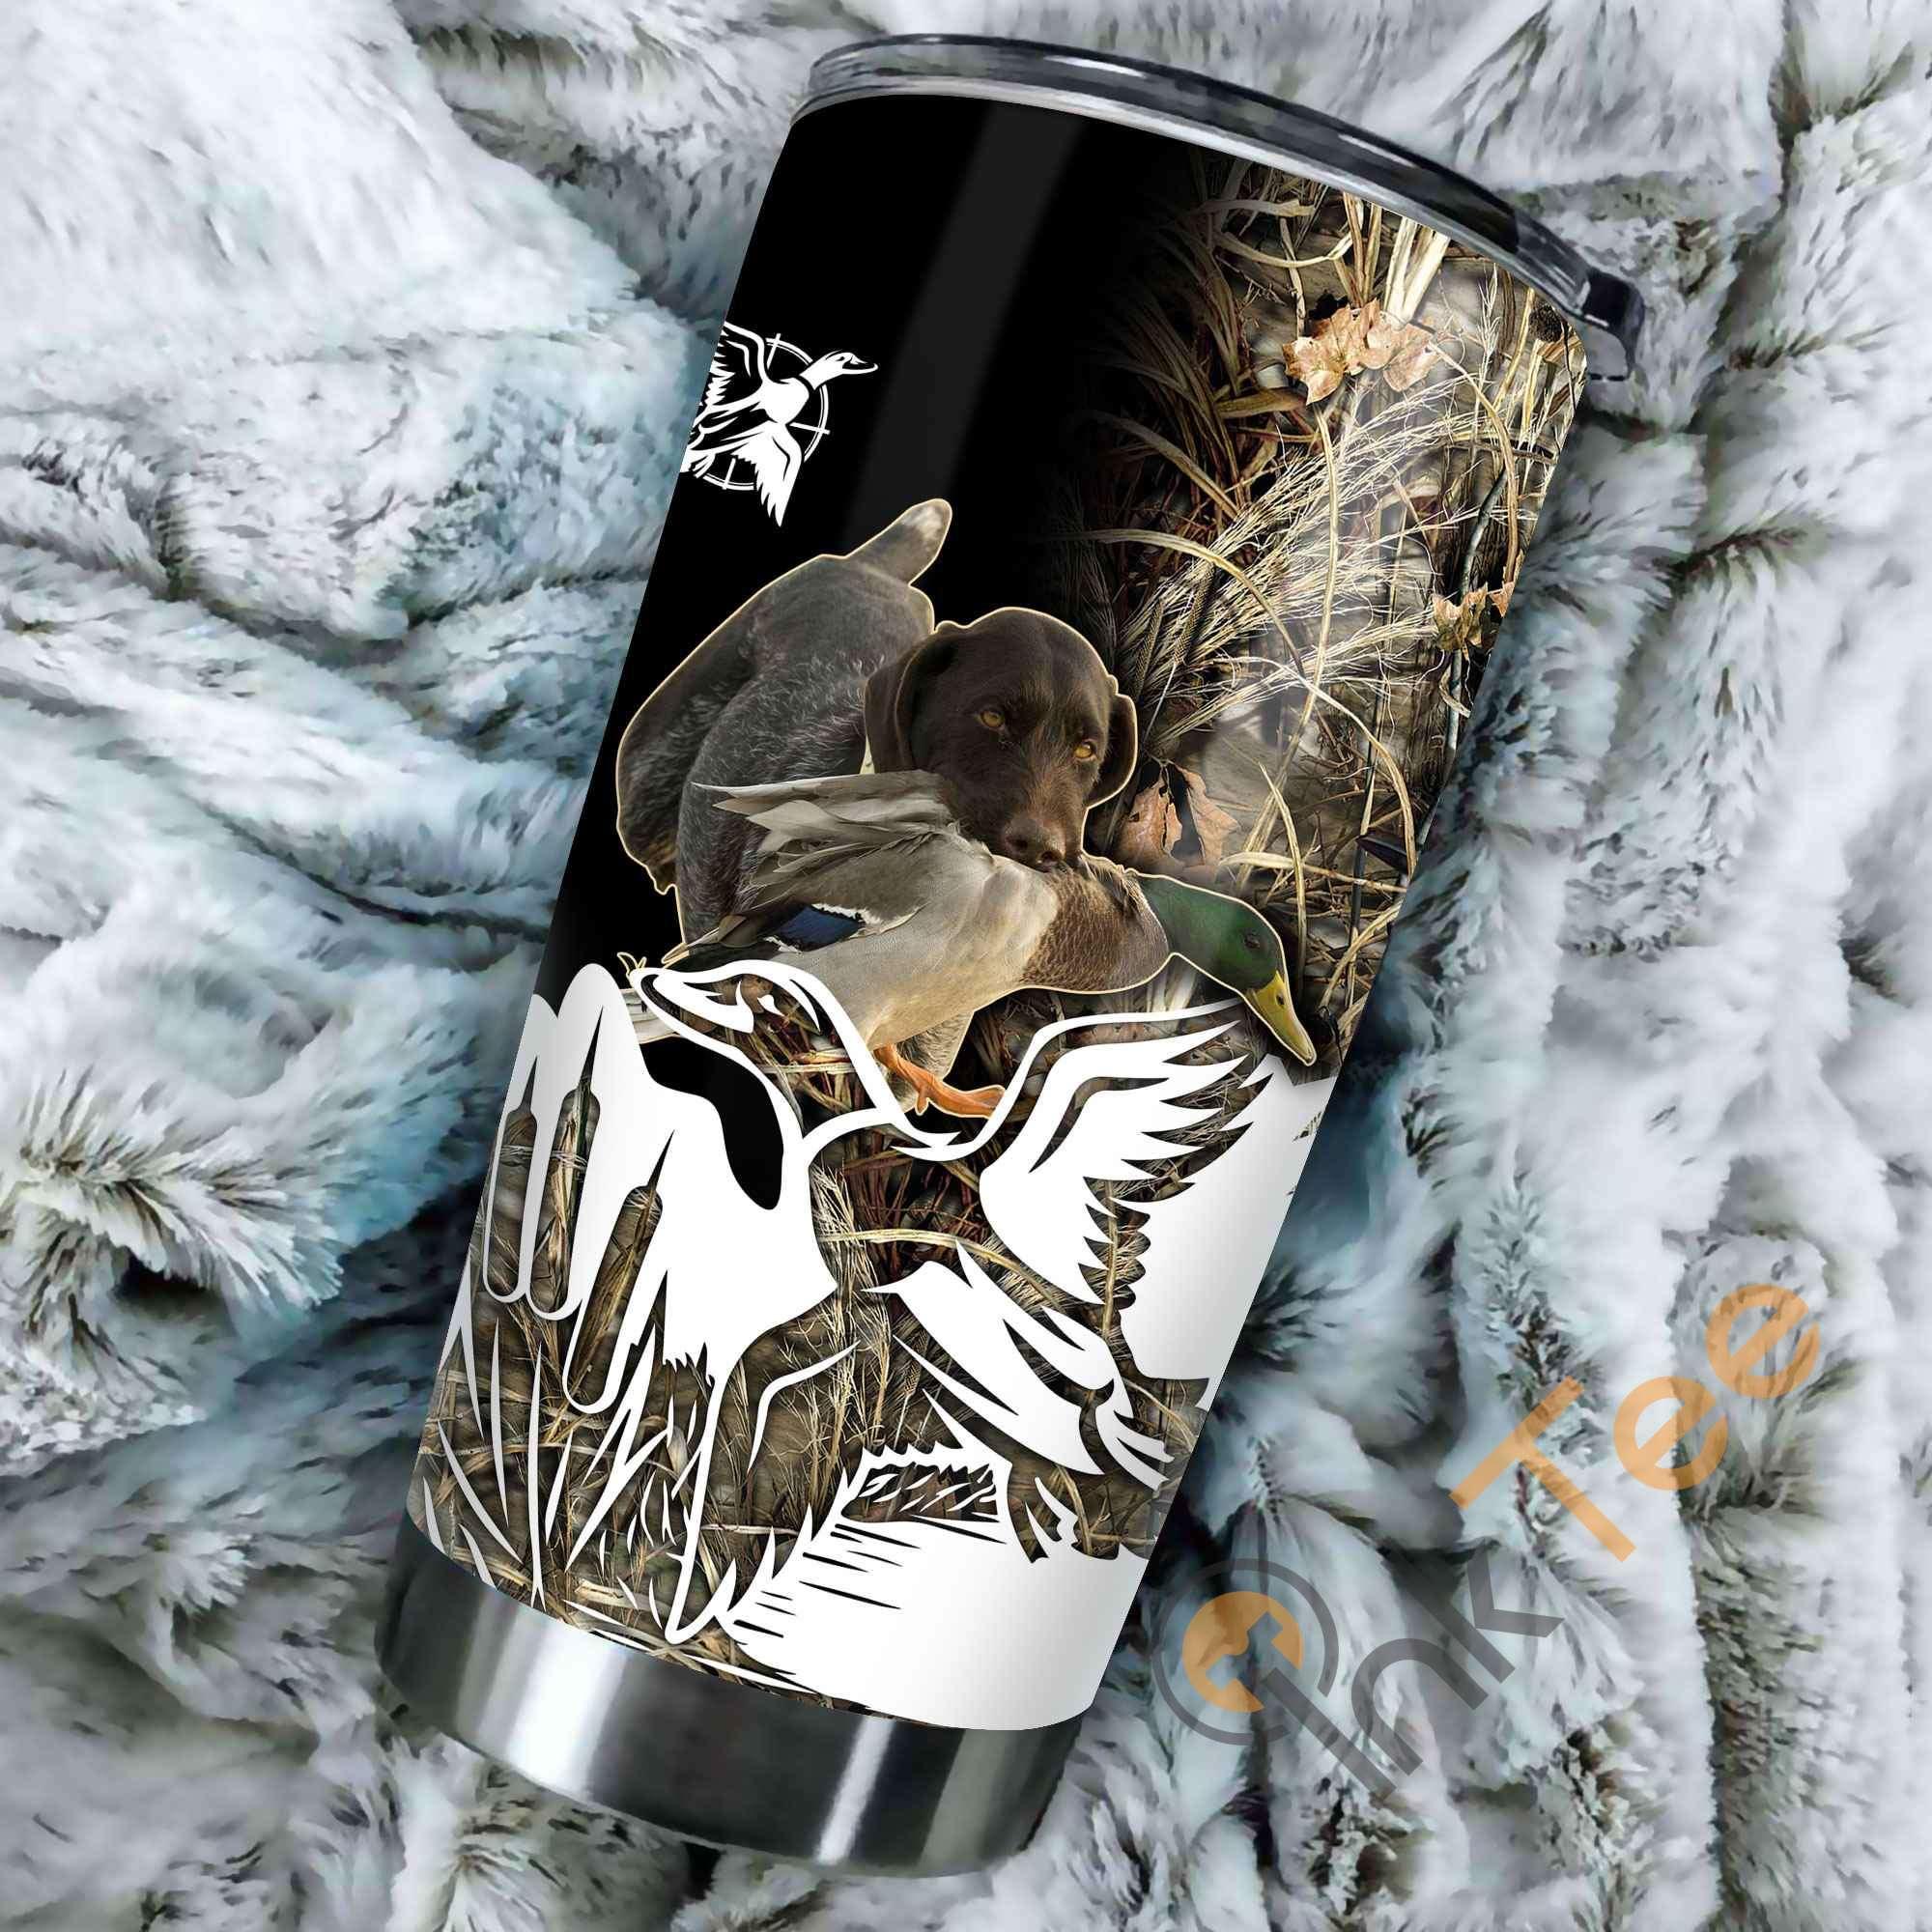 Duck Hunting Amazon Best Seller Sku 3725 Stainless Steel Tumbler